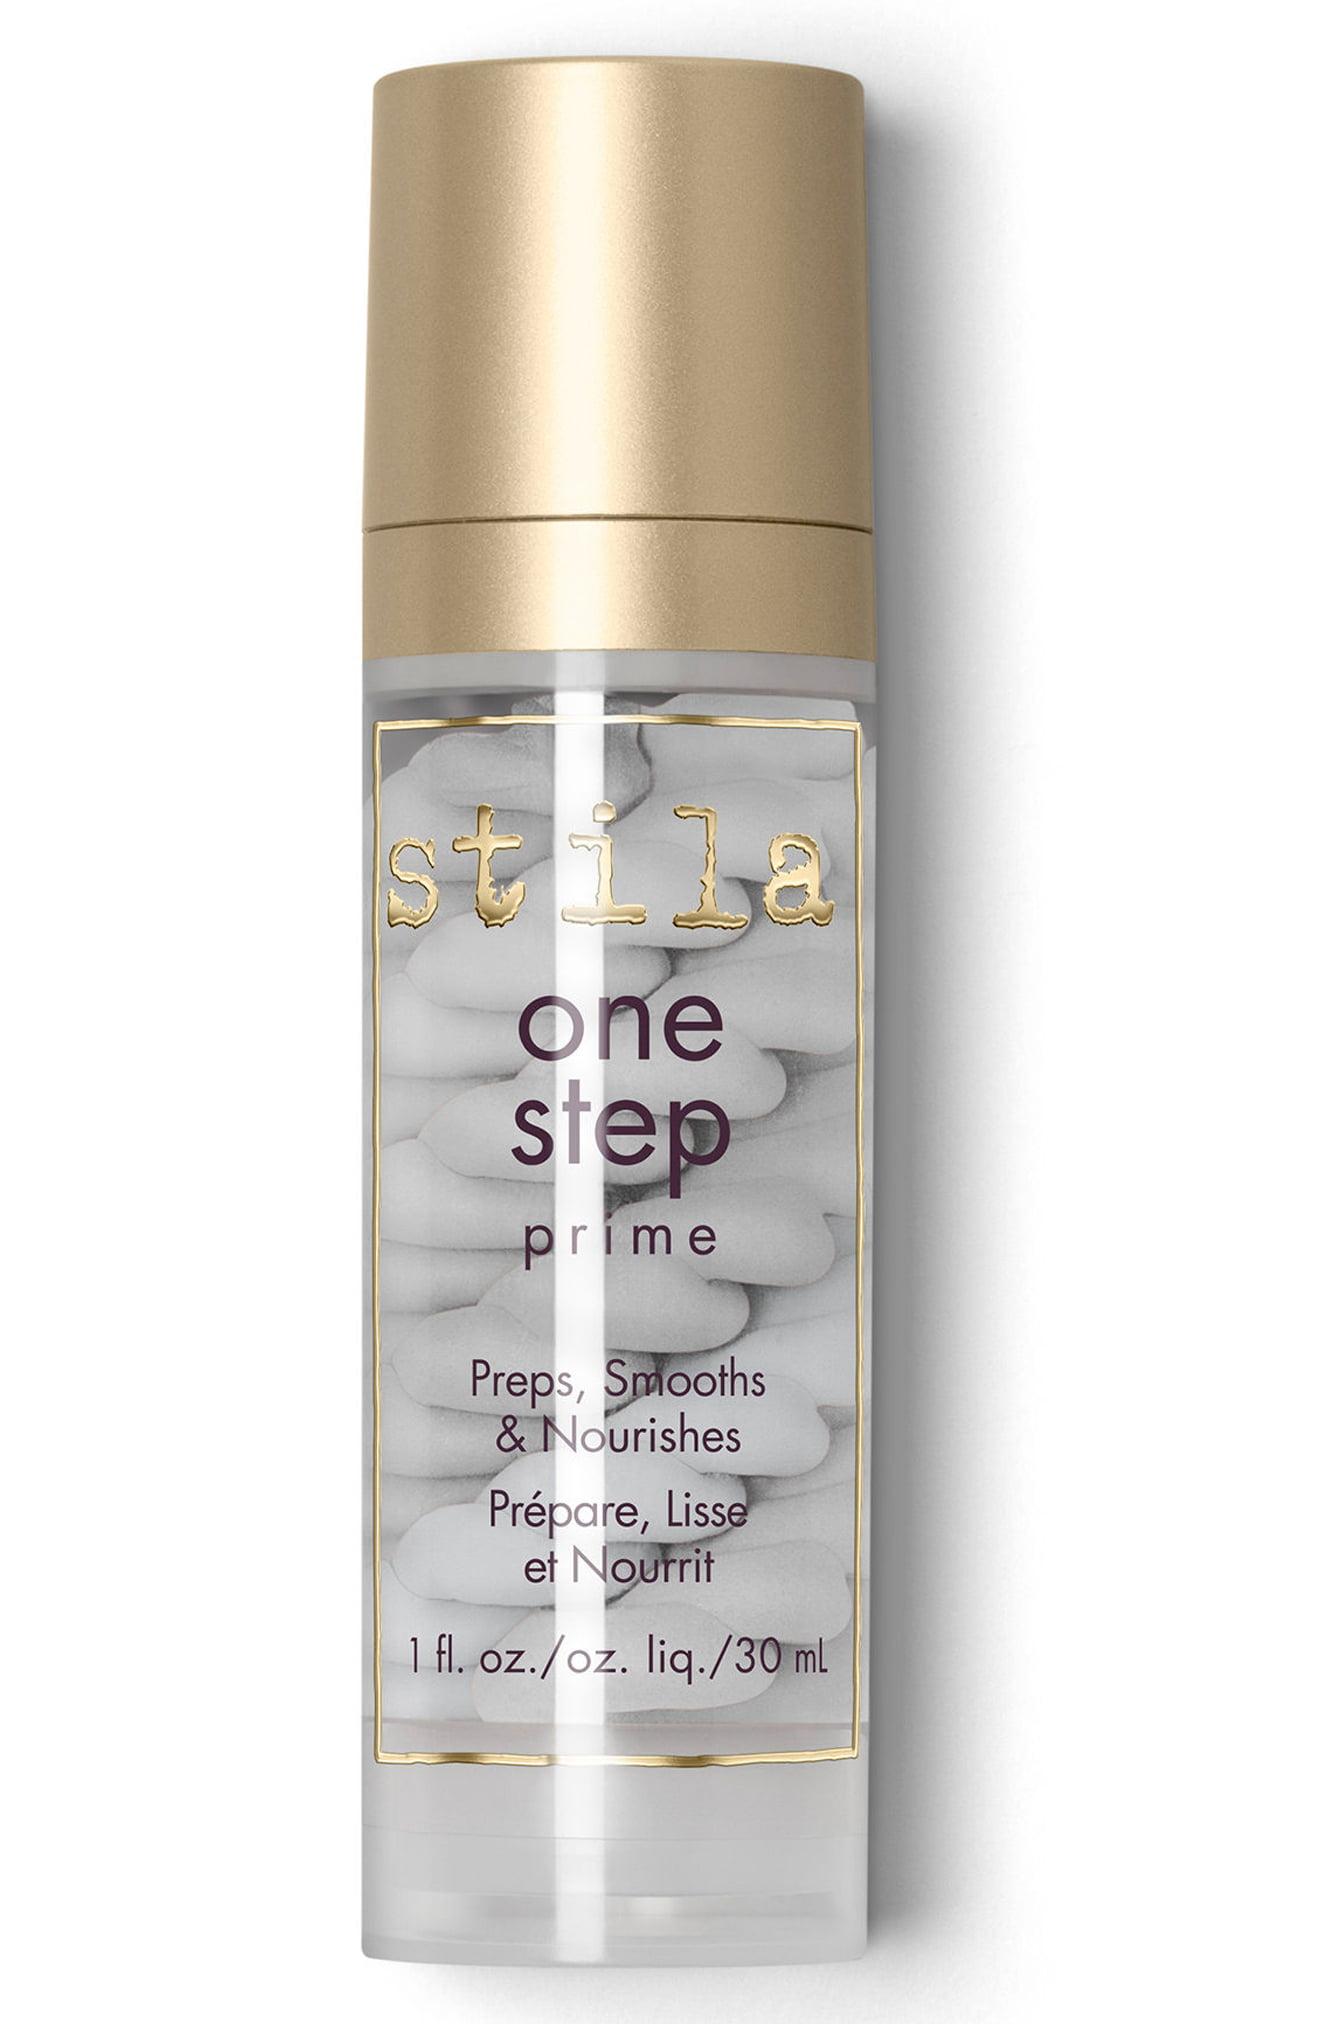 1-Oz Stila One Step Makeup Primer $15 + Free Shipping